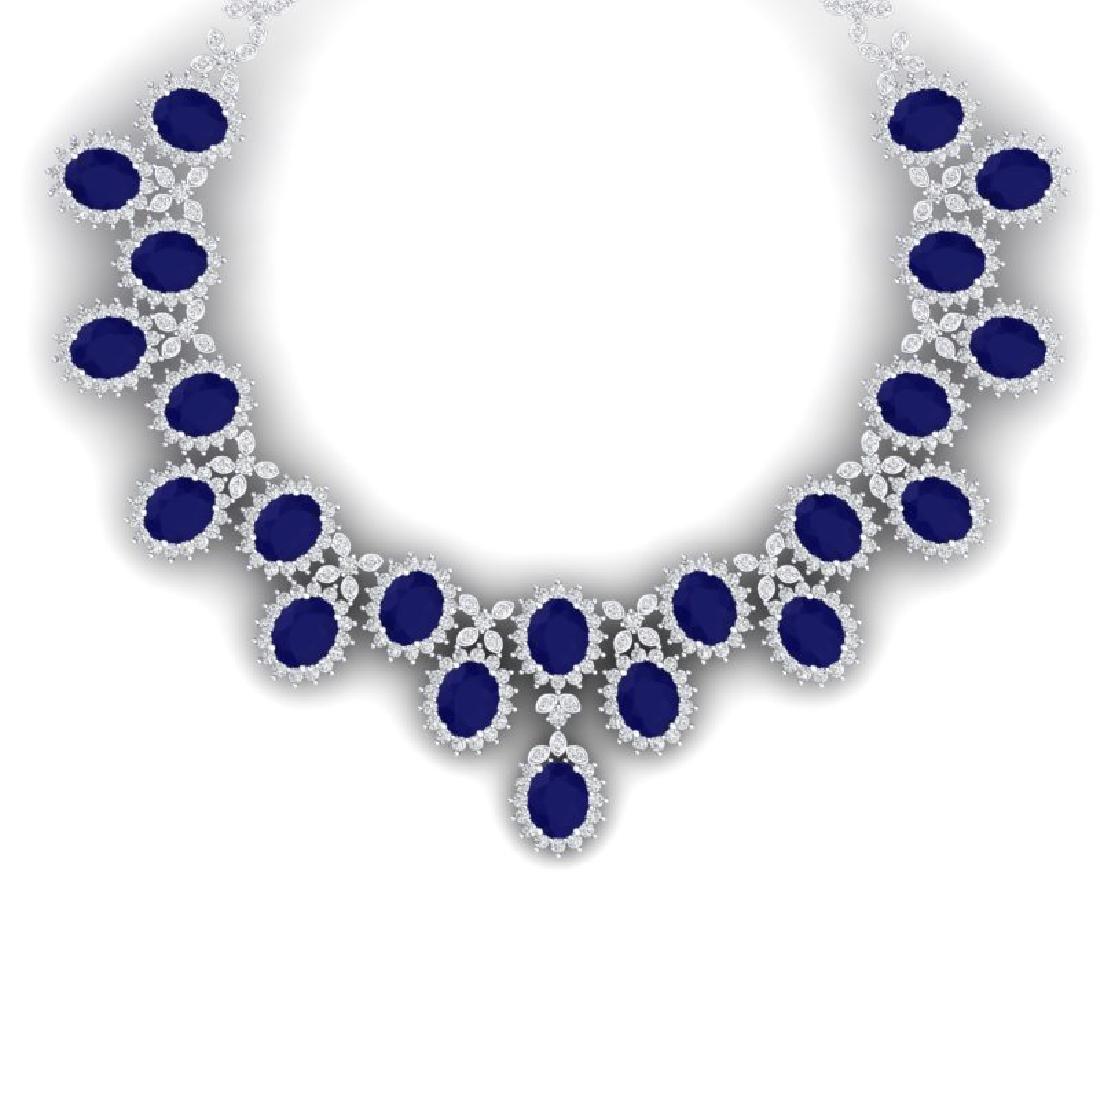 81 CTW Royalty Sapphire & VS Diamond Necklace 18K White